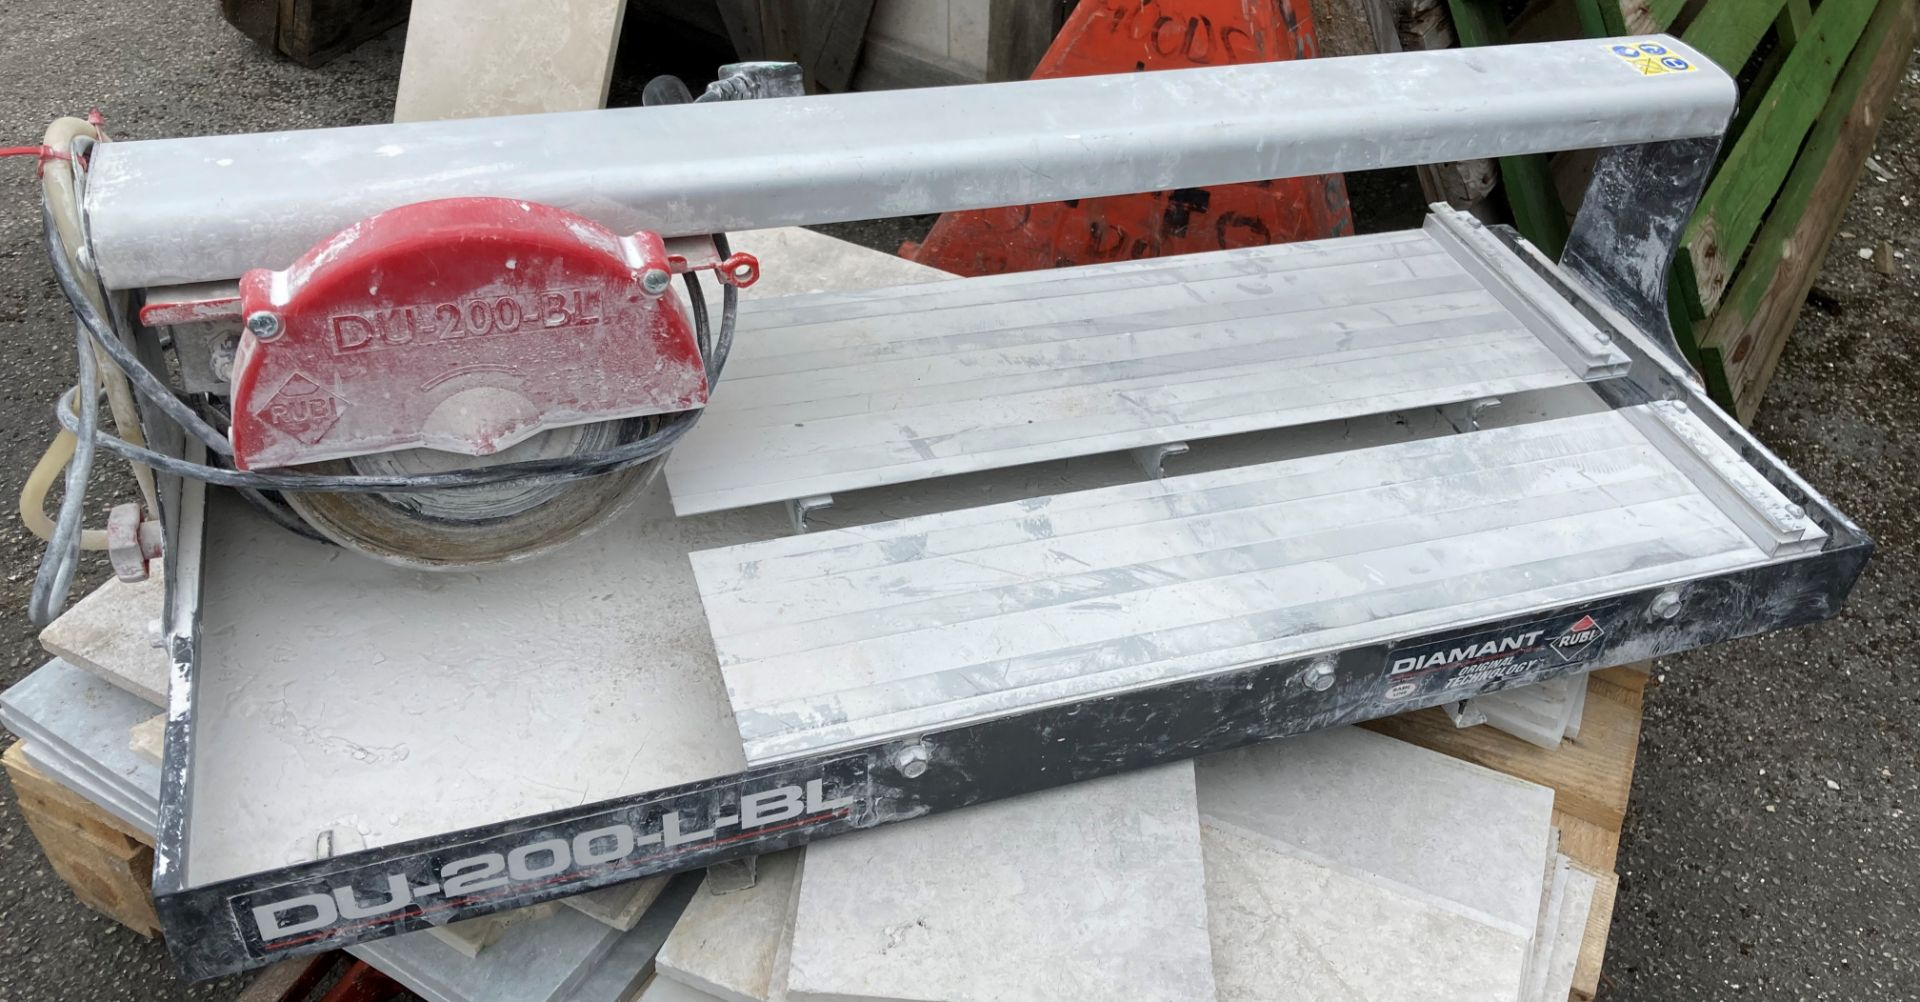 RUBI DIAMANT DU-200-BL cutting bed 60cm 240v tile cutter